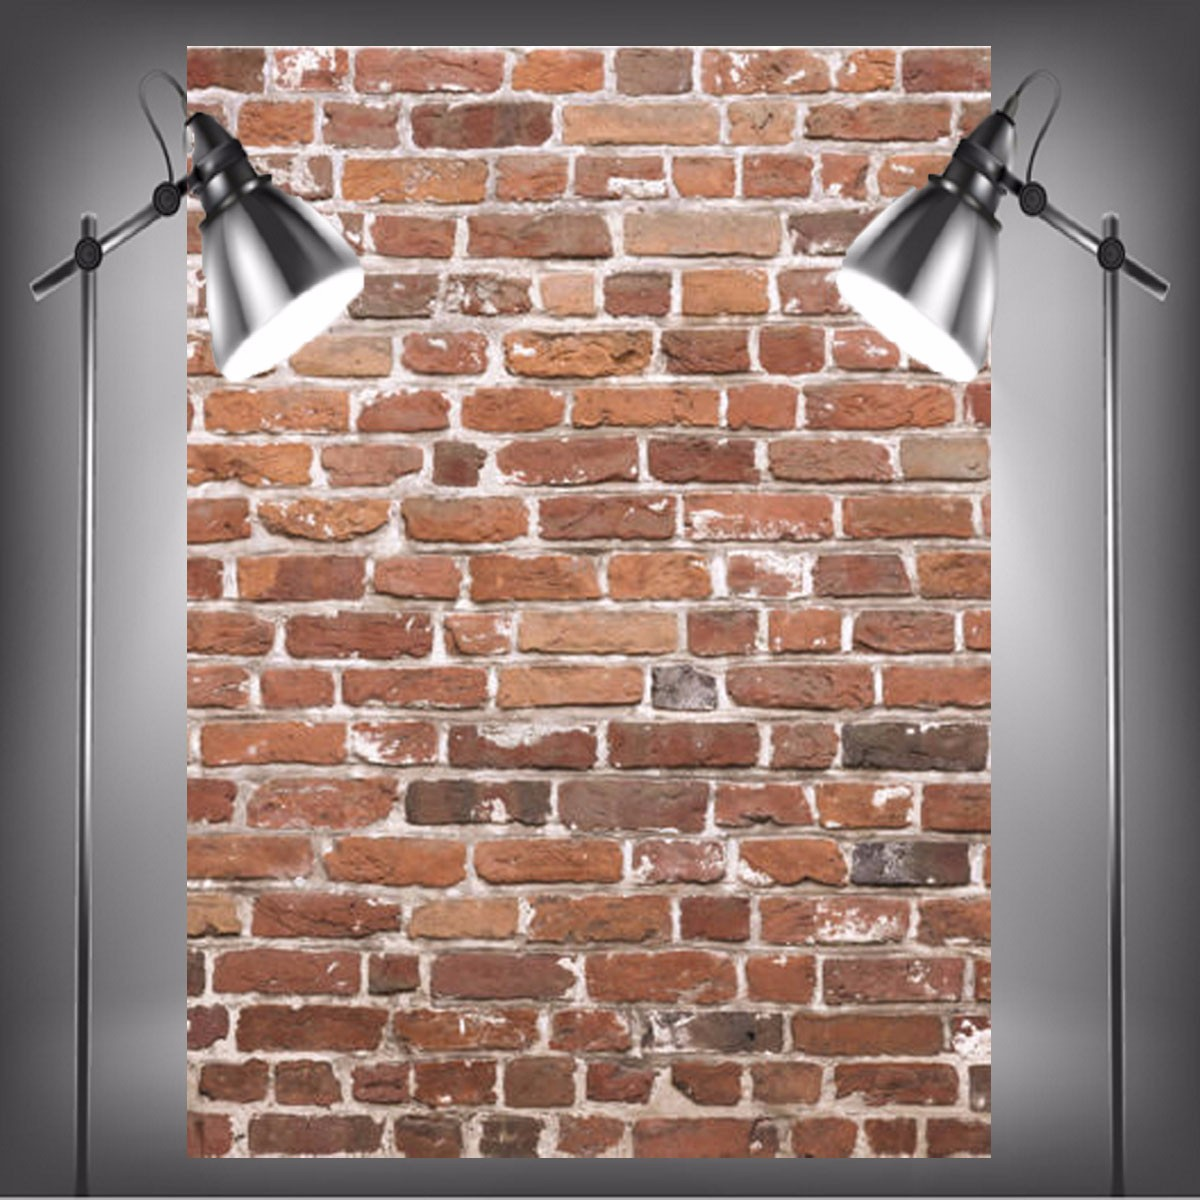 Bricks Studio: 1.5×2.1m Photography Vinyl Background Worn Red Brick Wall